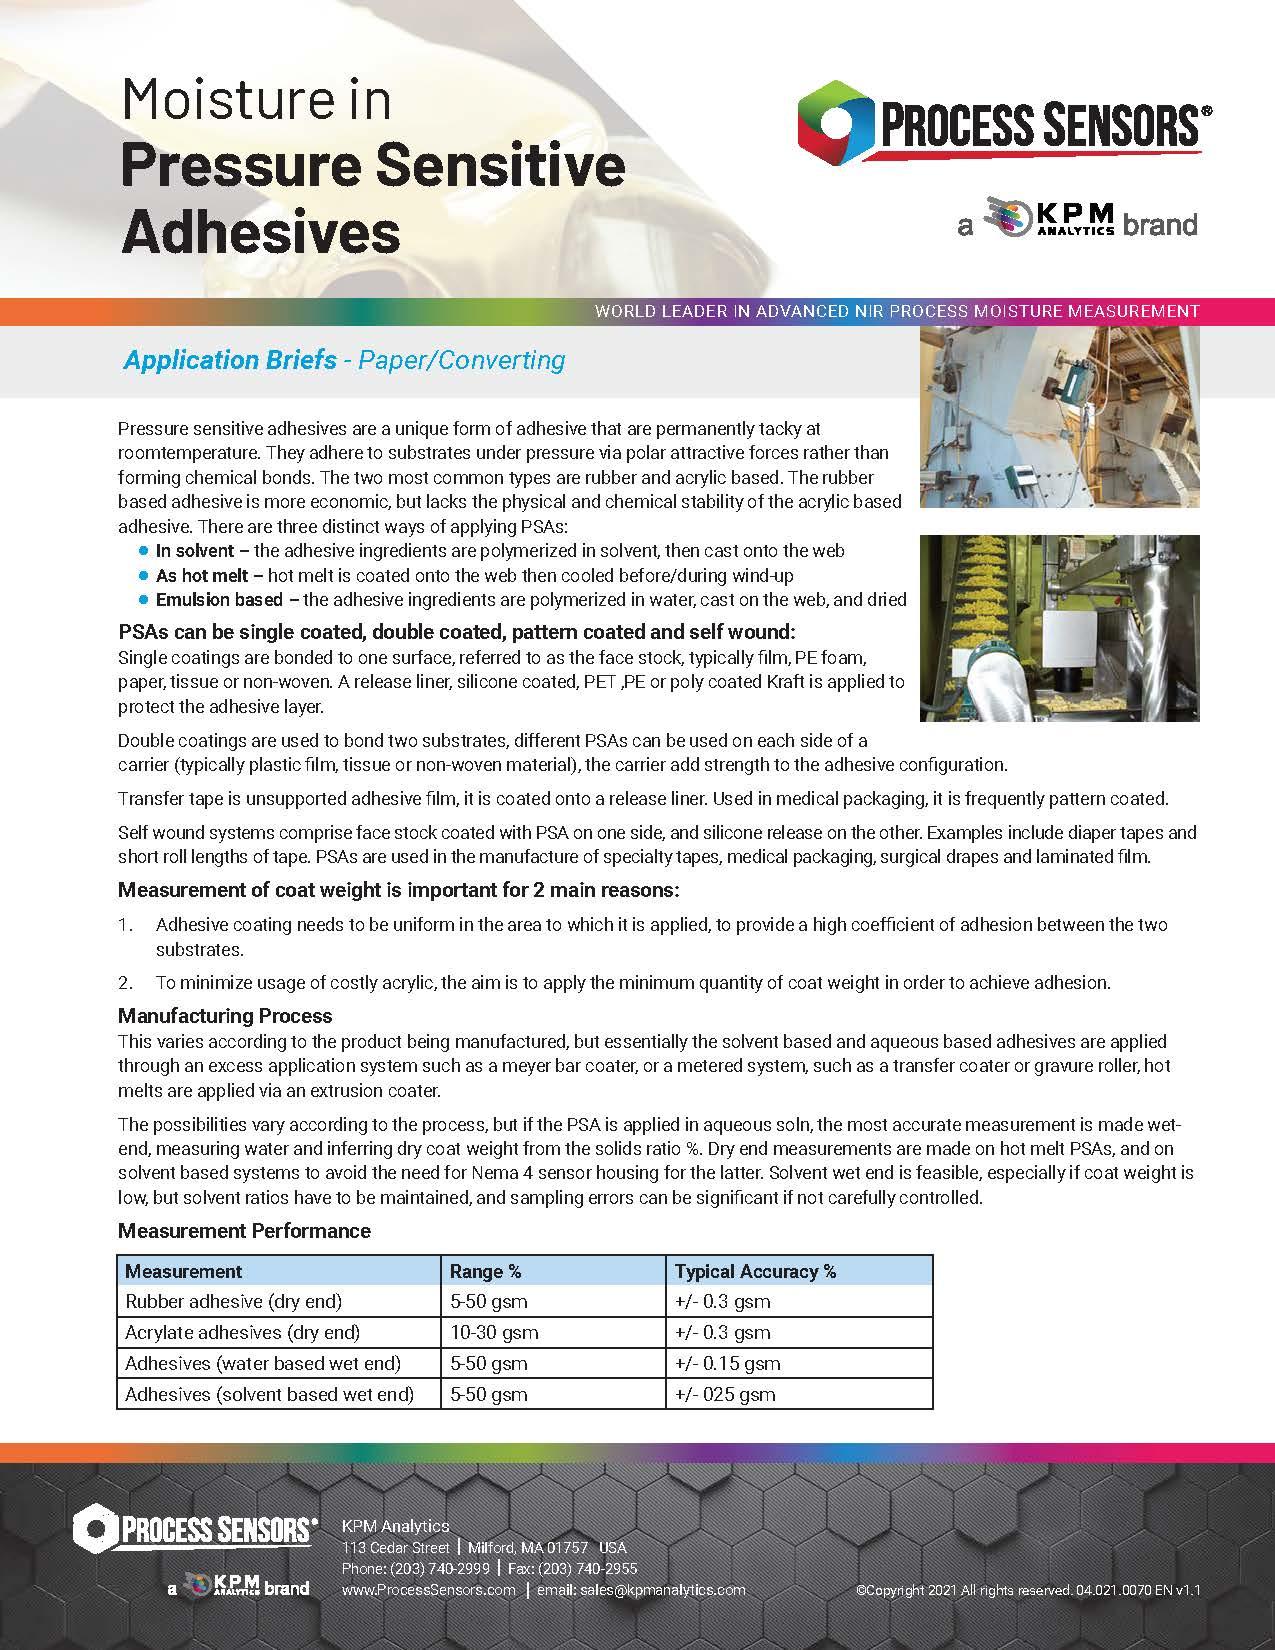 Moisture in Pressure Sensitive Adhesives